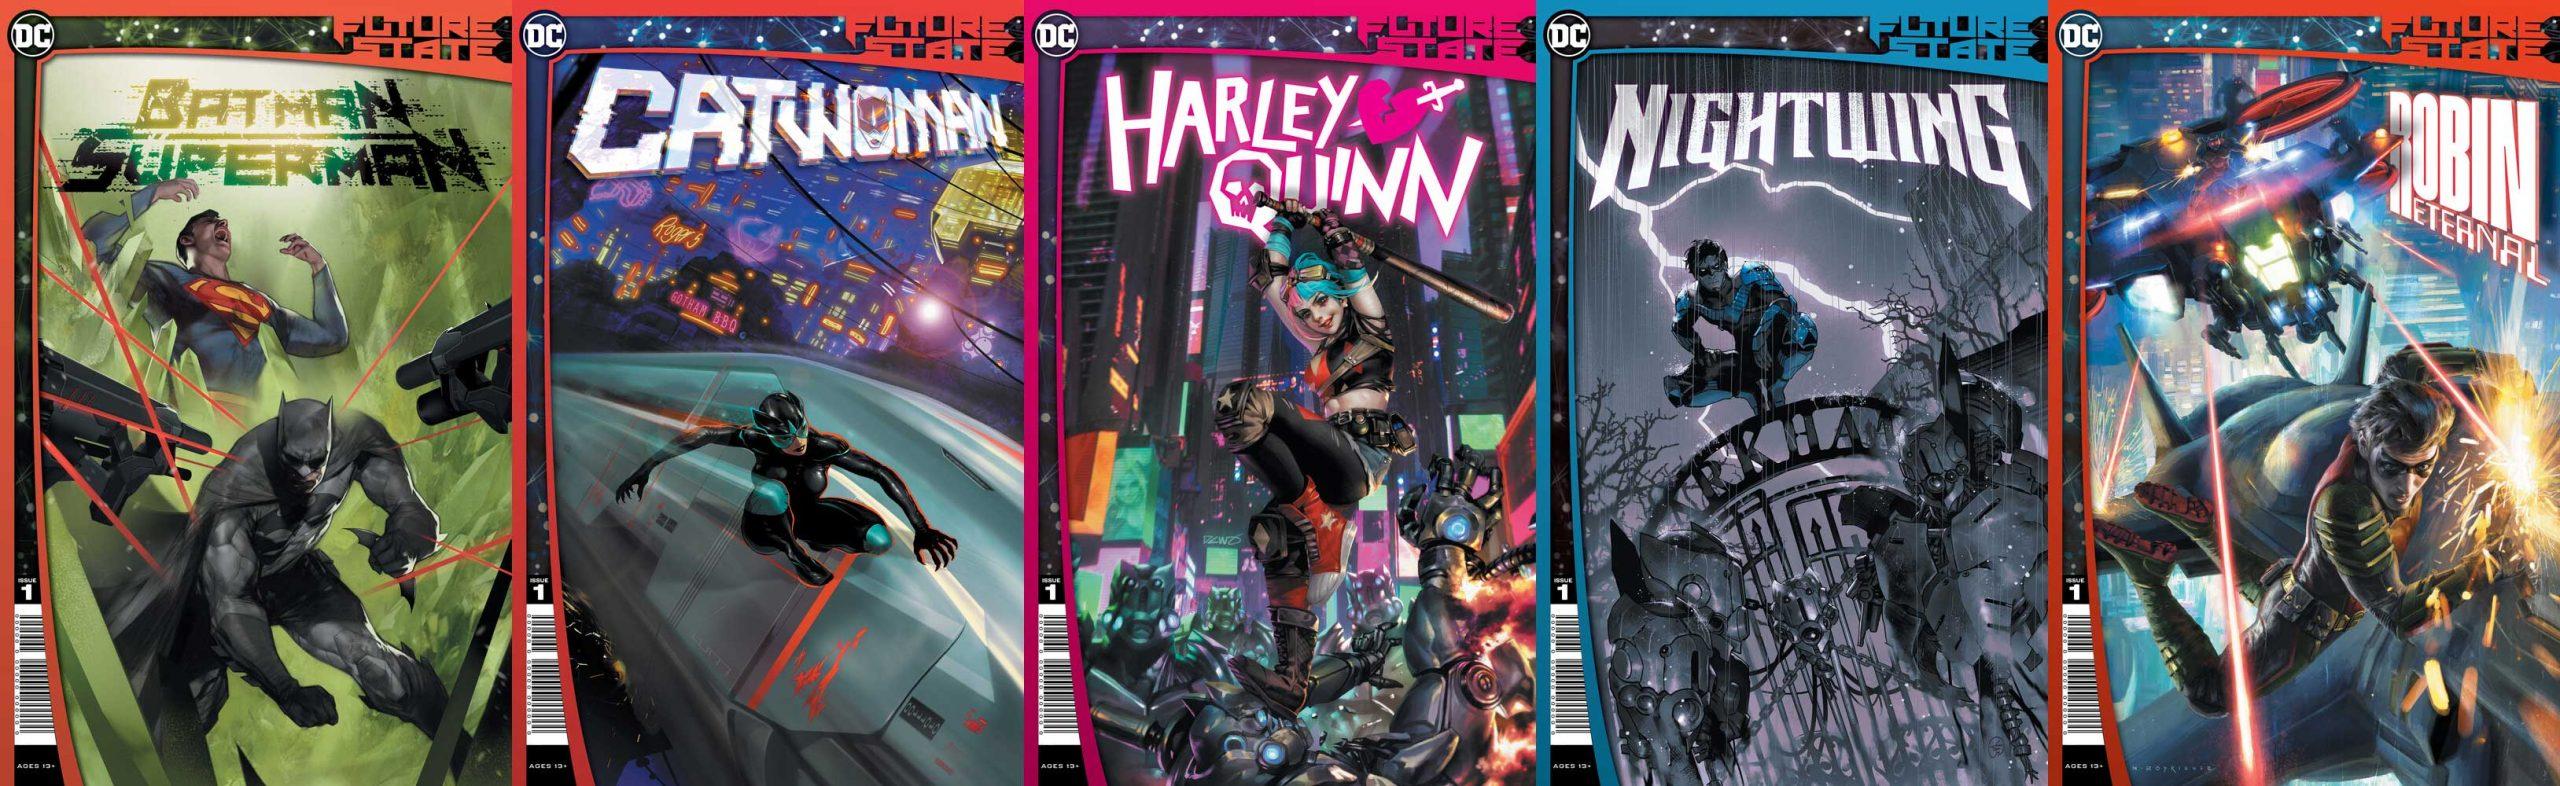 DC-Future-State-SupermanBatman-Catwoman-HarleyQuinn-Nightwing-RobinEternal-DCComics